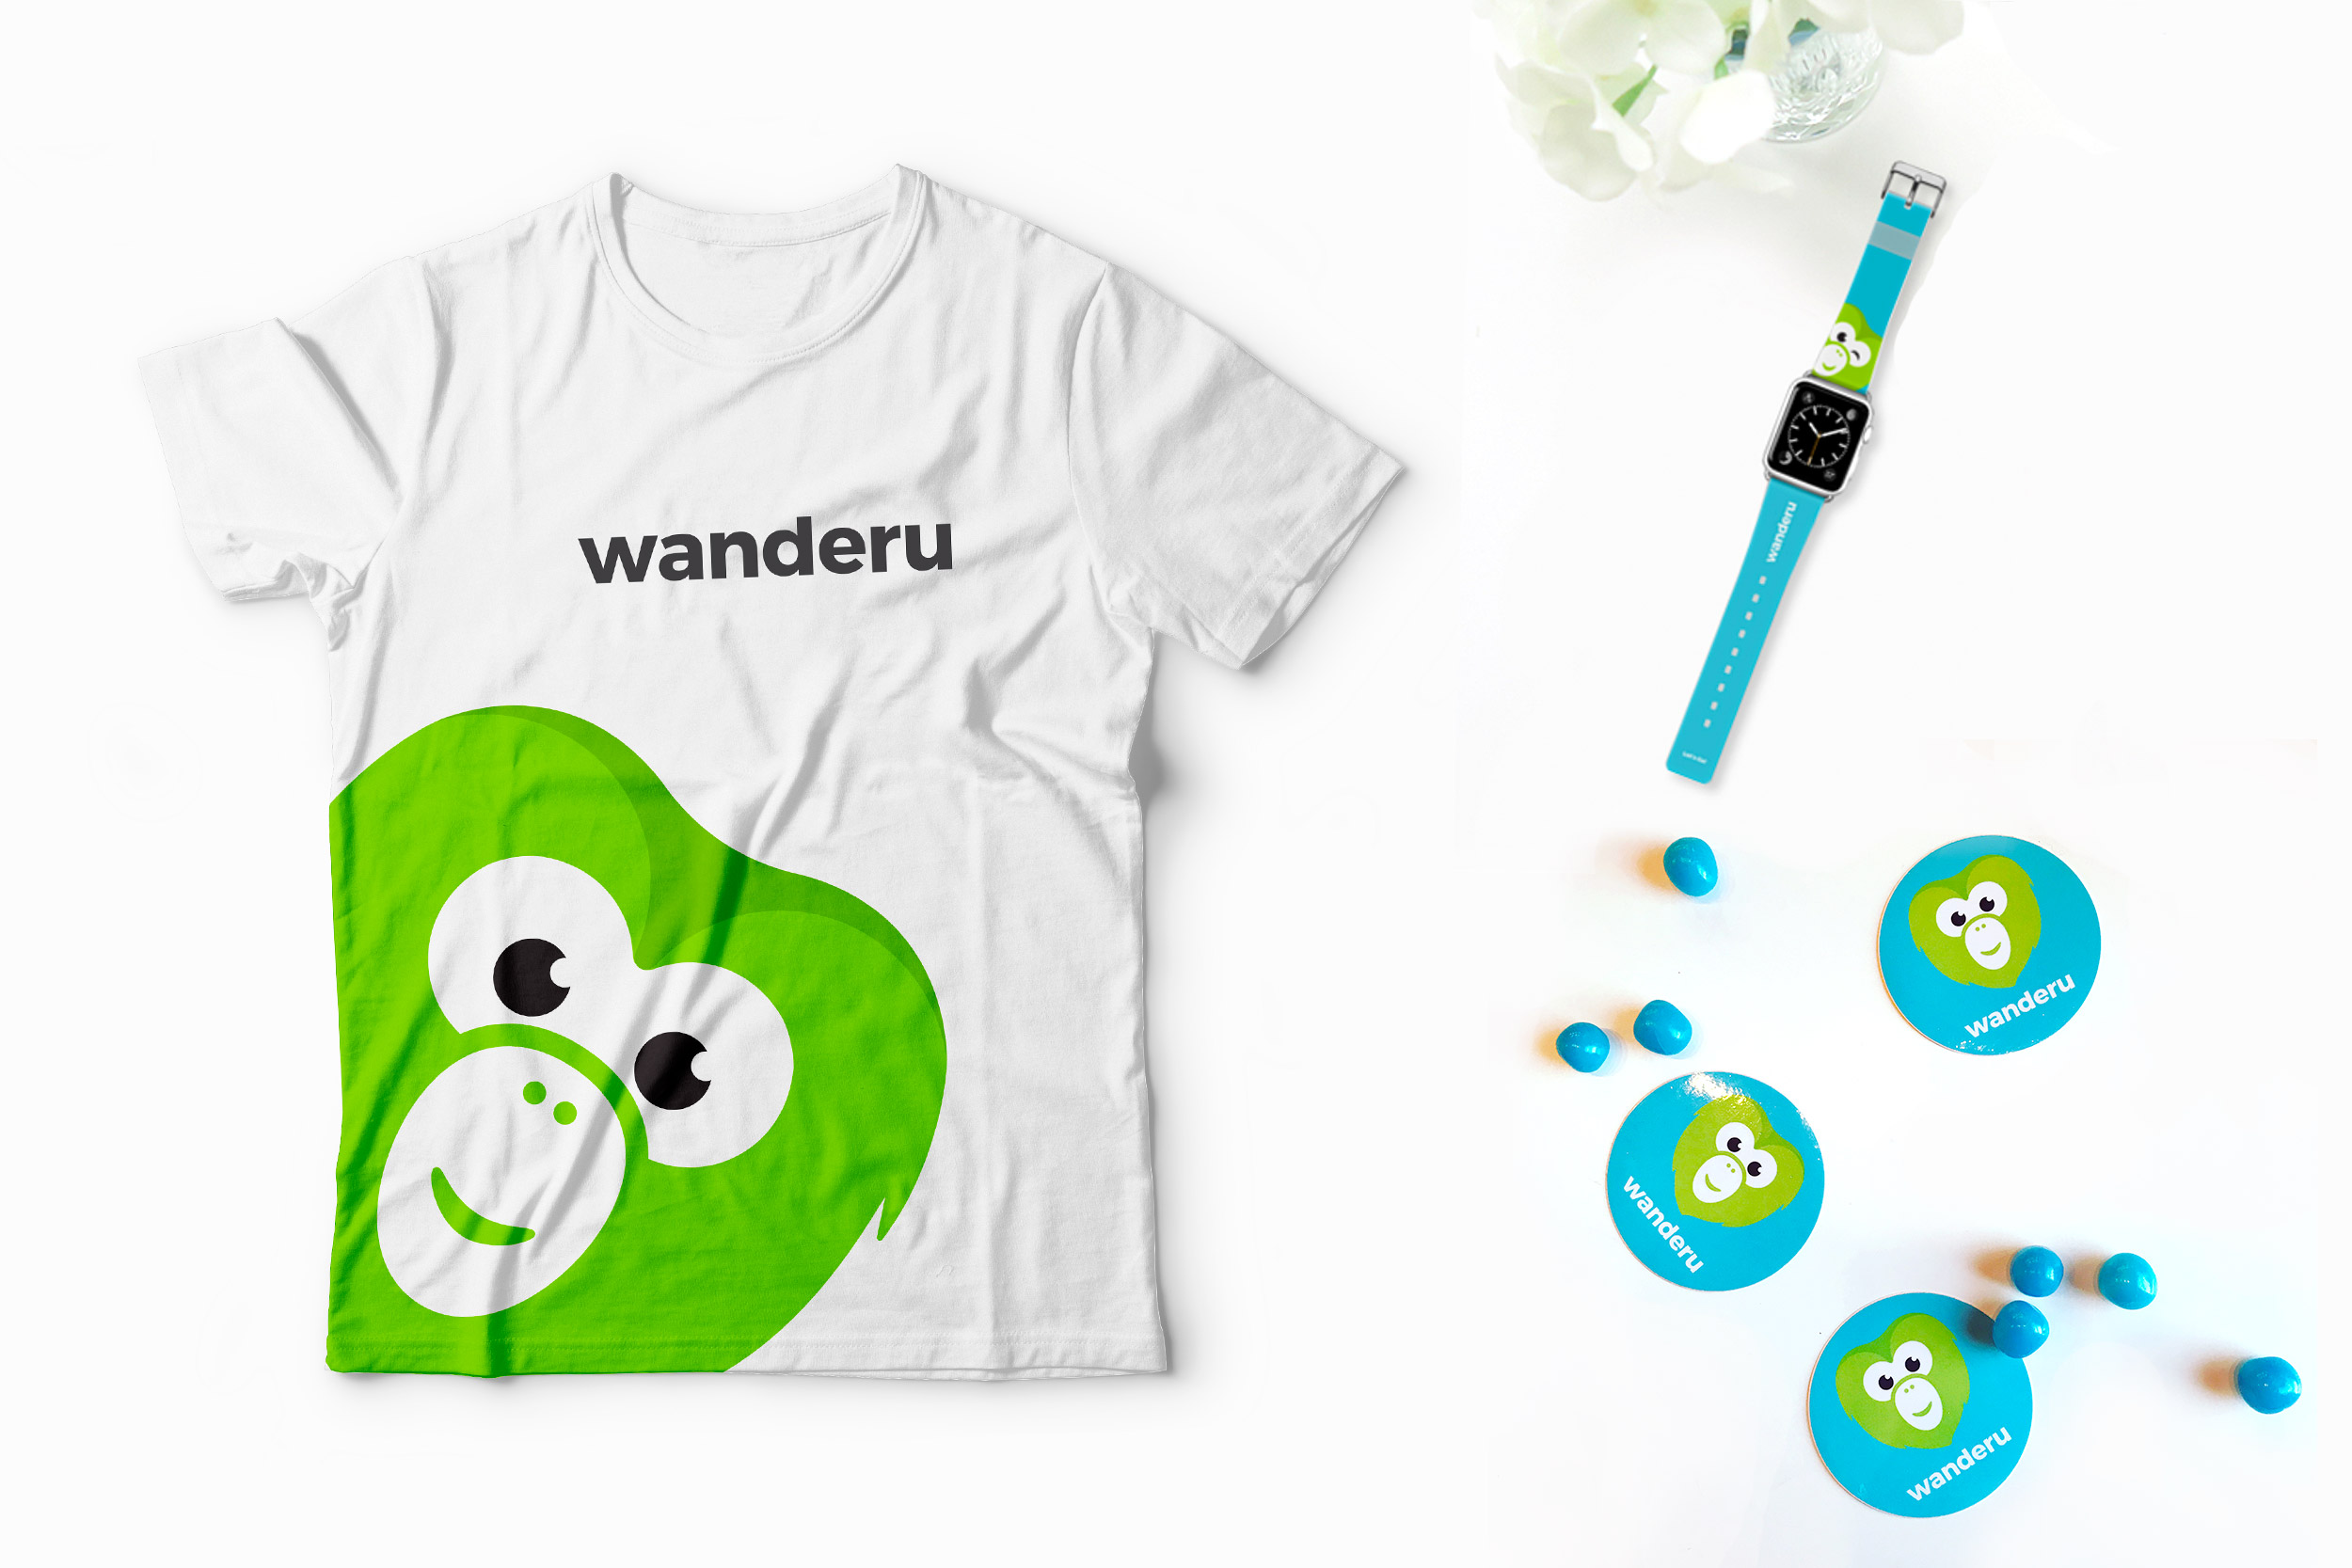 Wanderu brand identity design. T-shirt design, custom apple watch straps, and custom stickers.